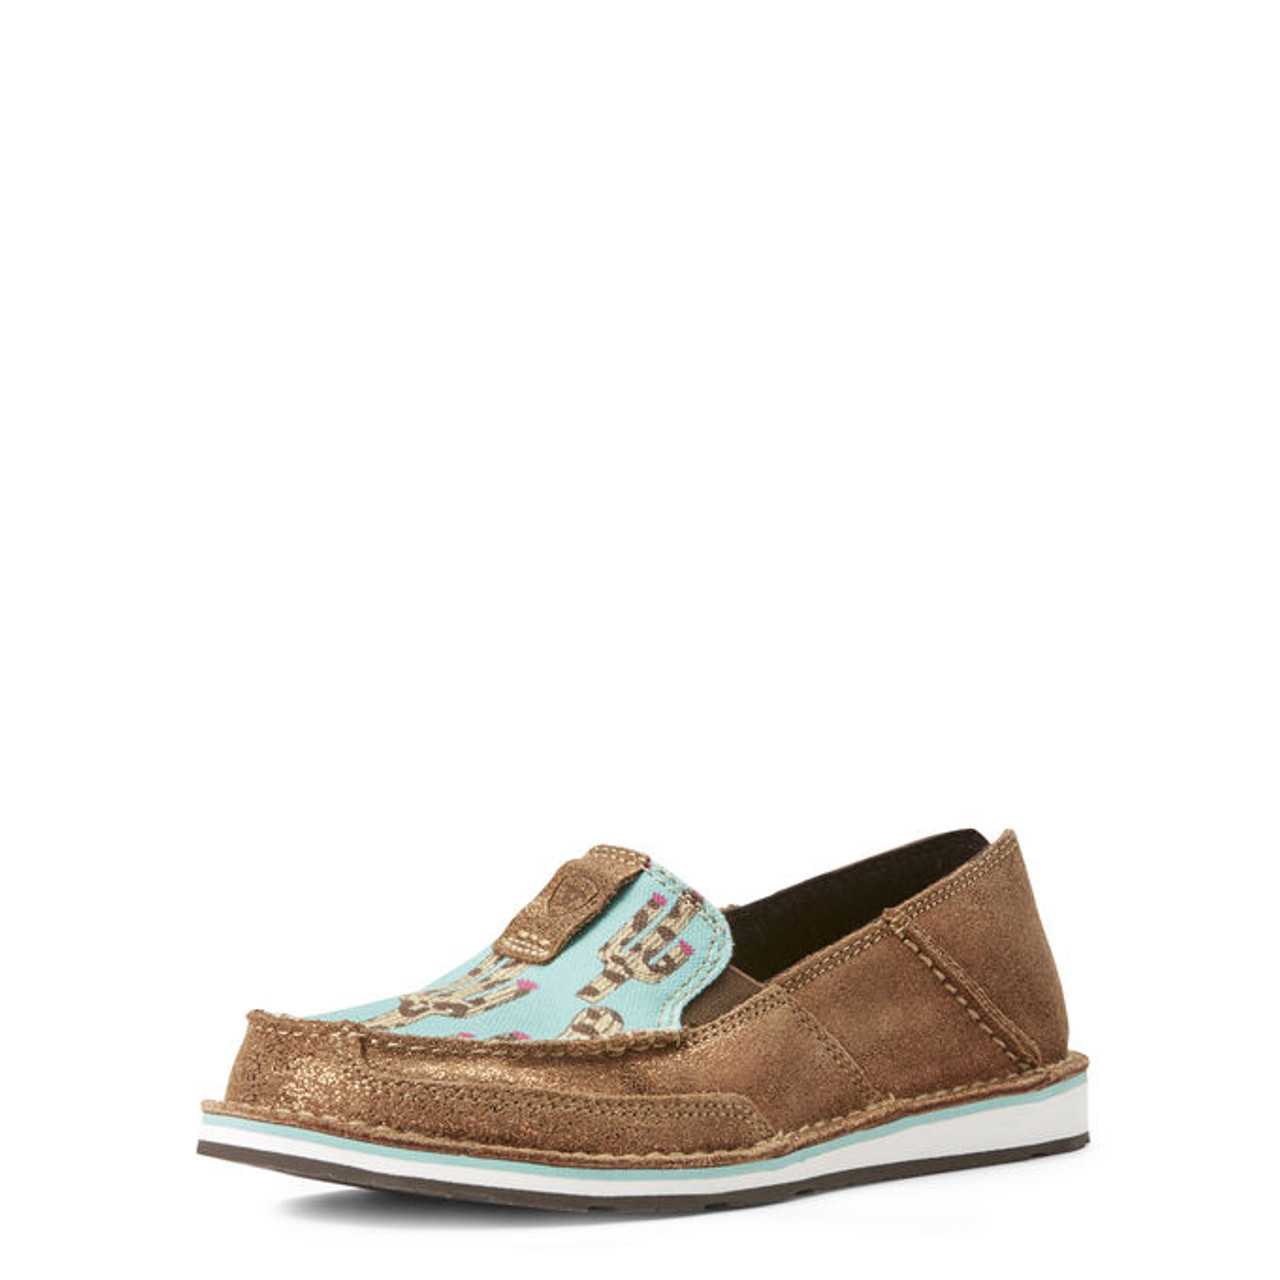 10027352 Ariat Women/'s Cactus Cruiser Shoe NEW